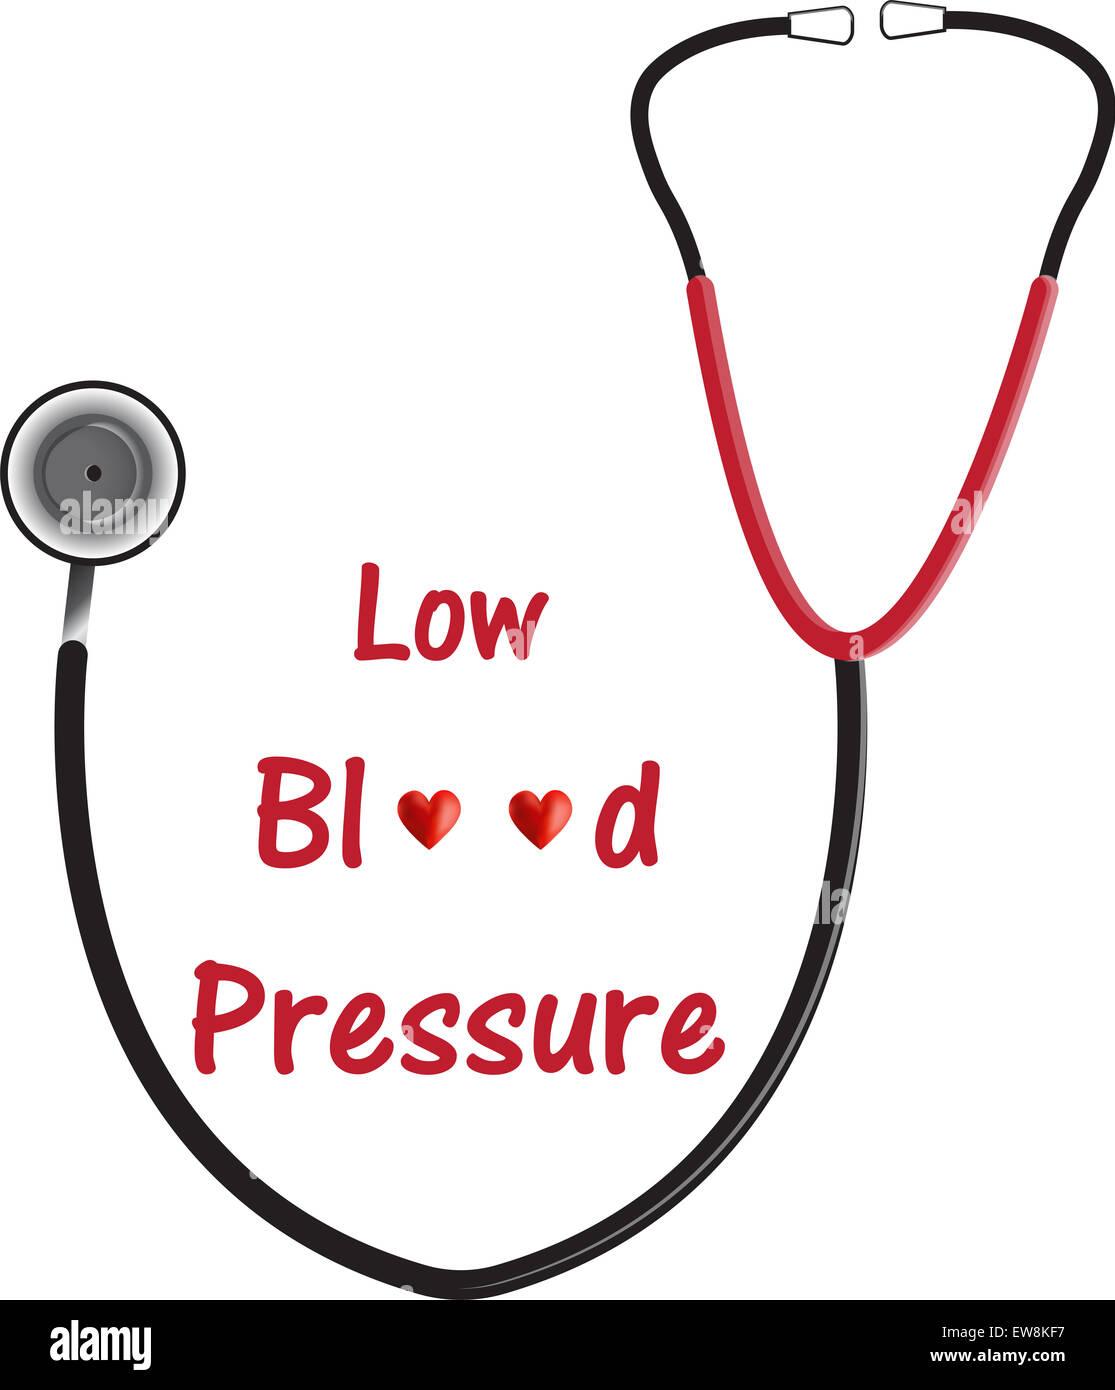 Low Blood Pressure - Stock Image